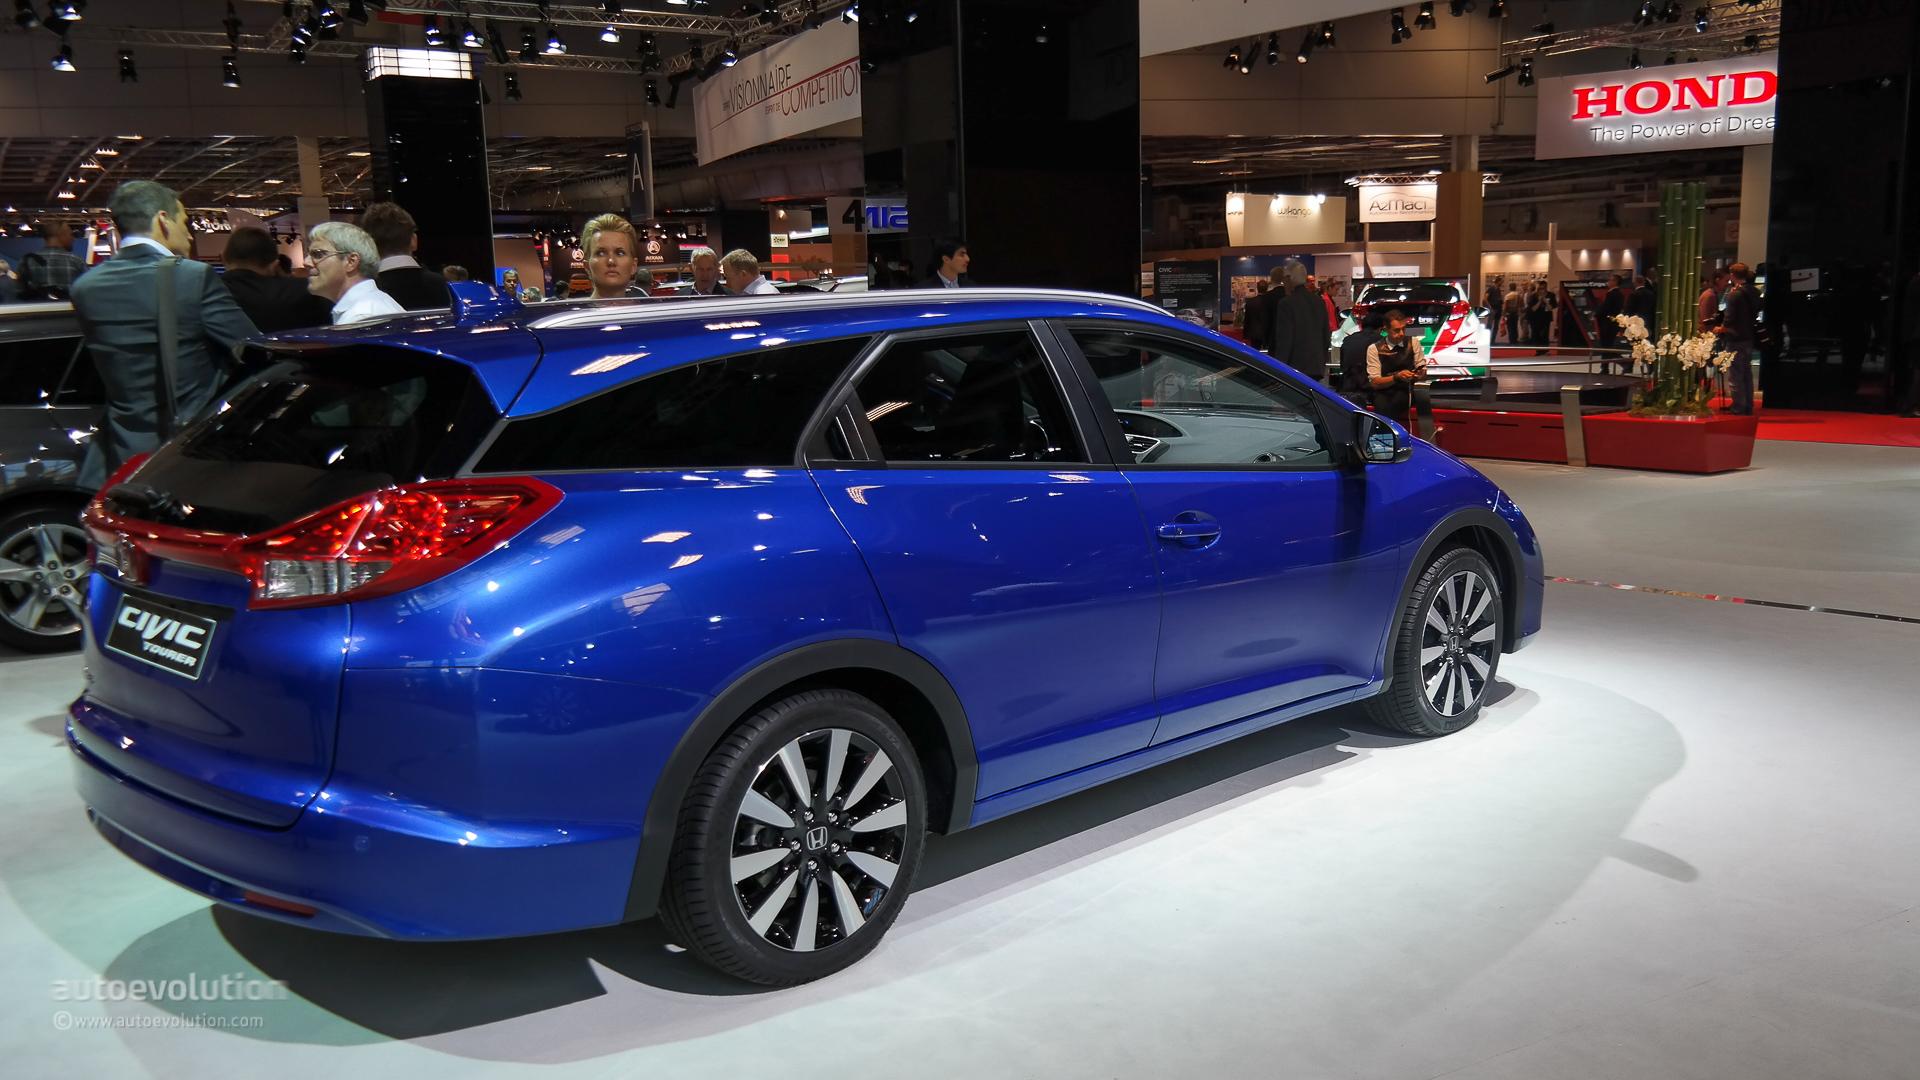 honda civic 5 door hatchback coming to the us in 2016 car interior design. Black Bedroom Furniture Sets. Home Design Ideas